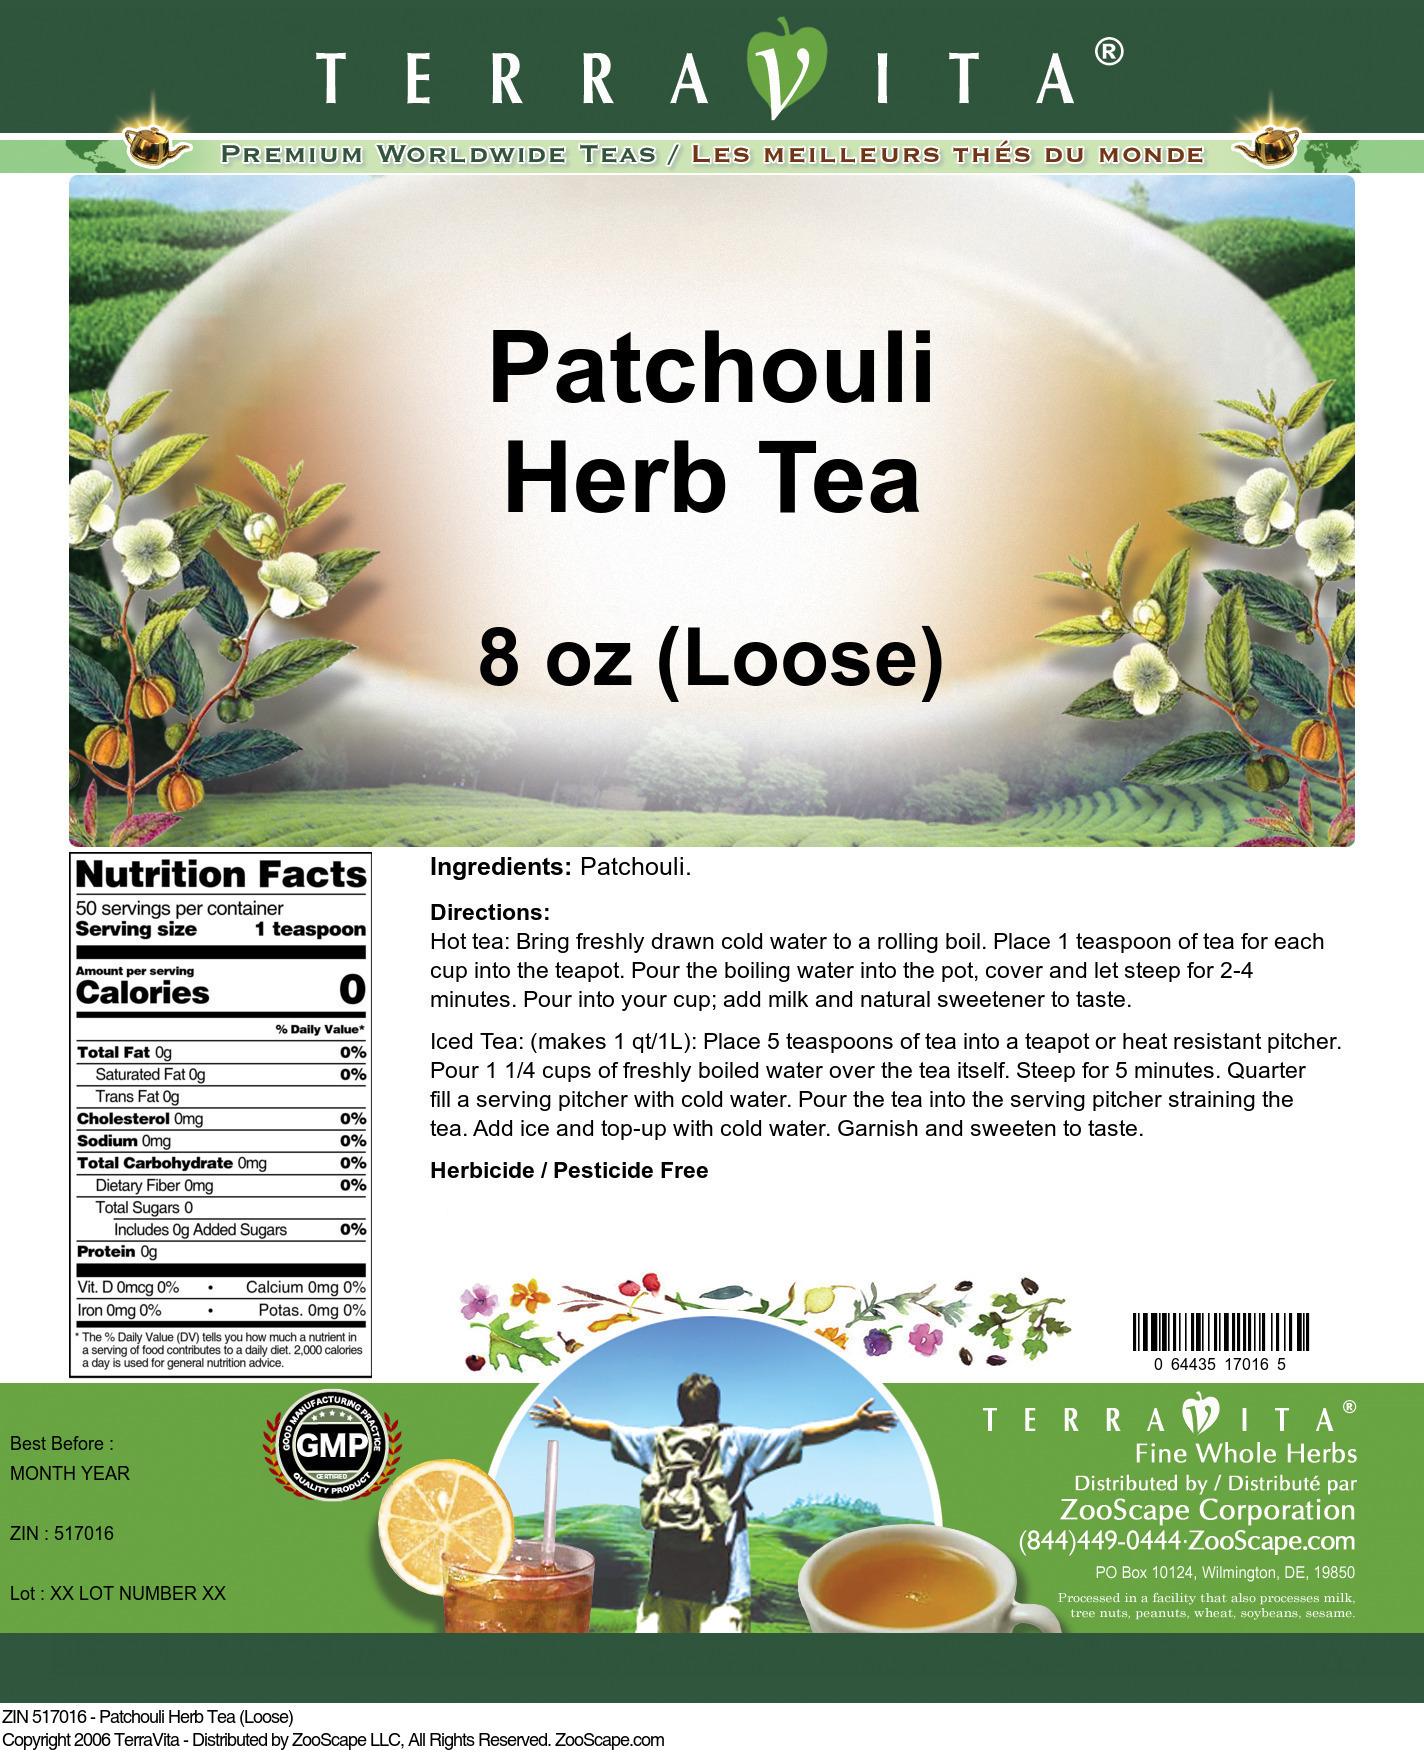 Patchouli Herb Tea (Loose)